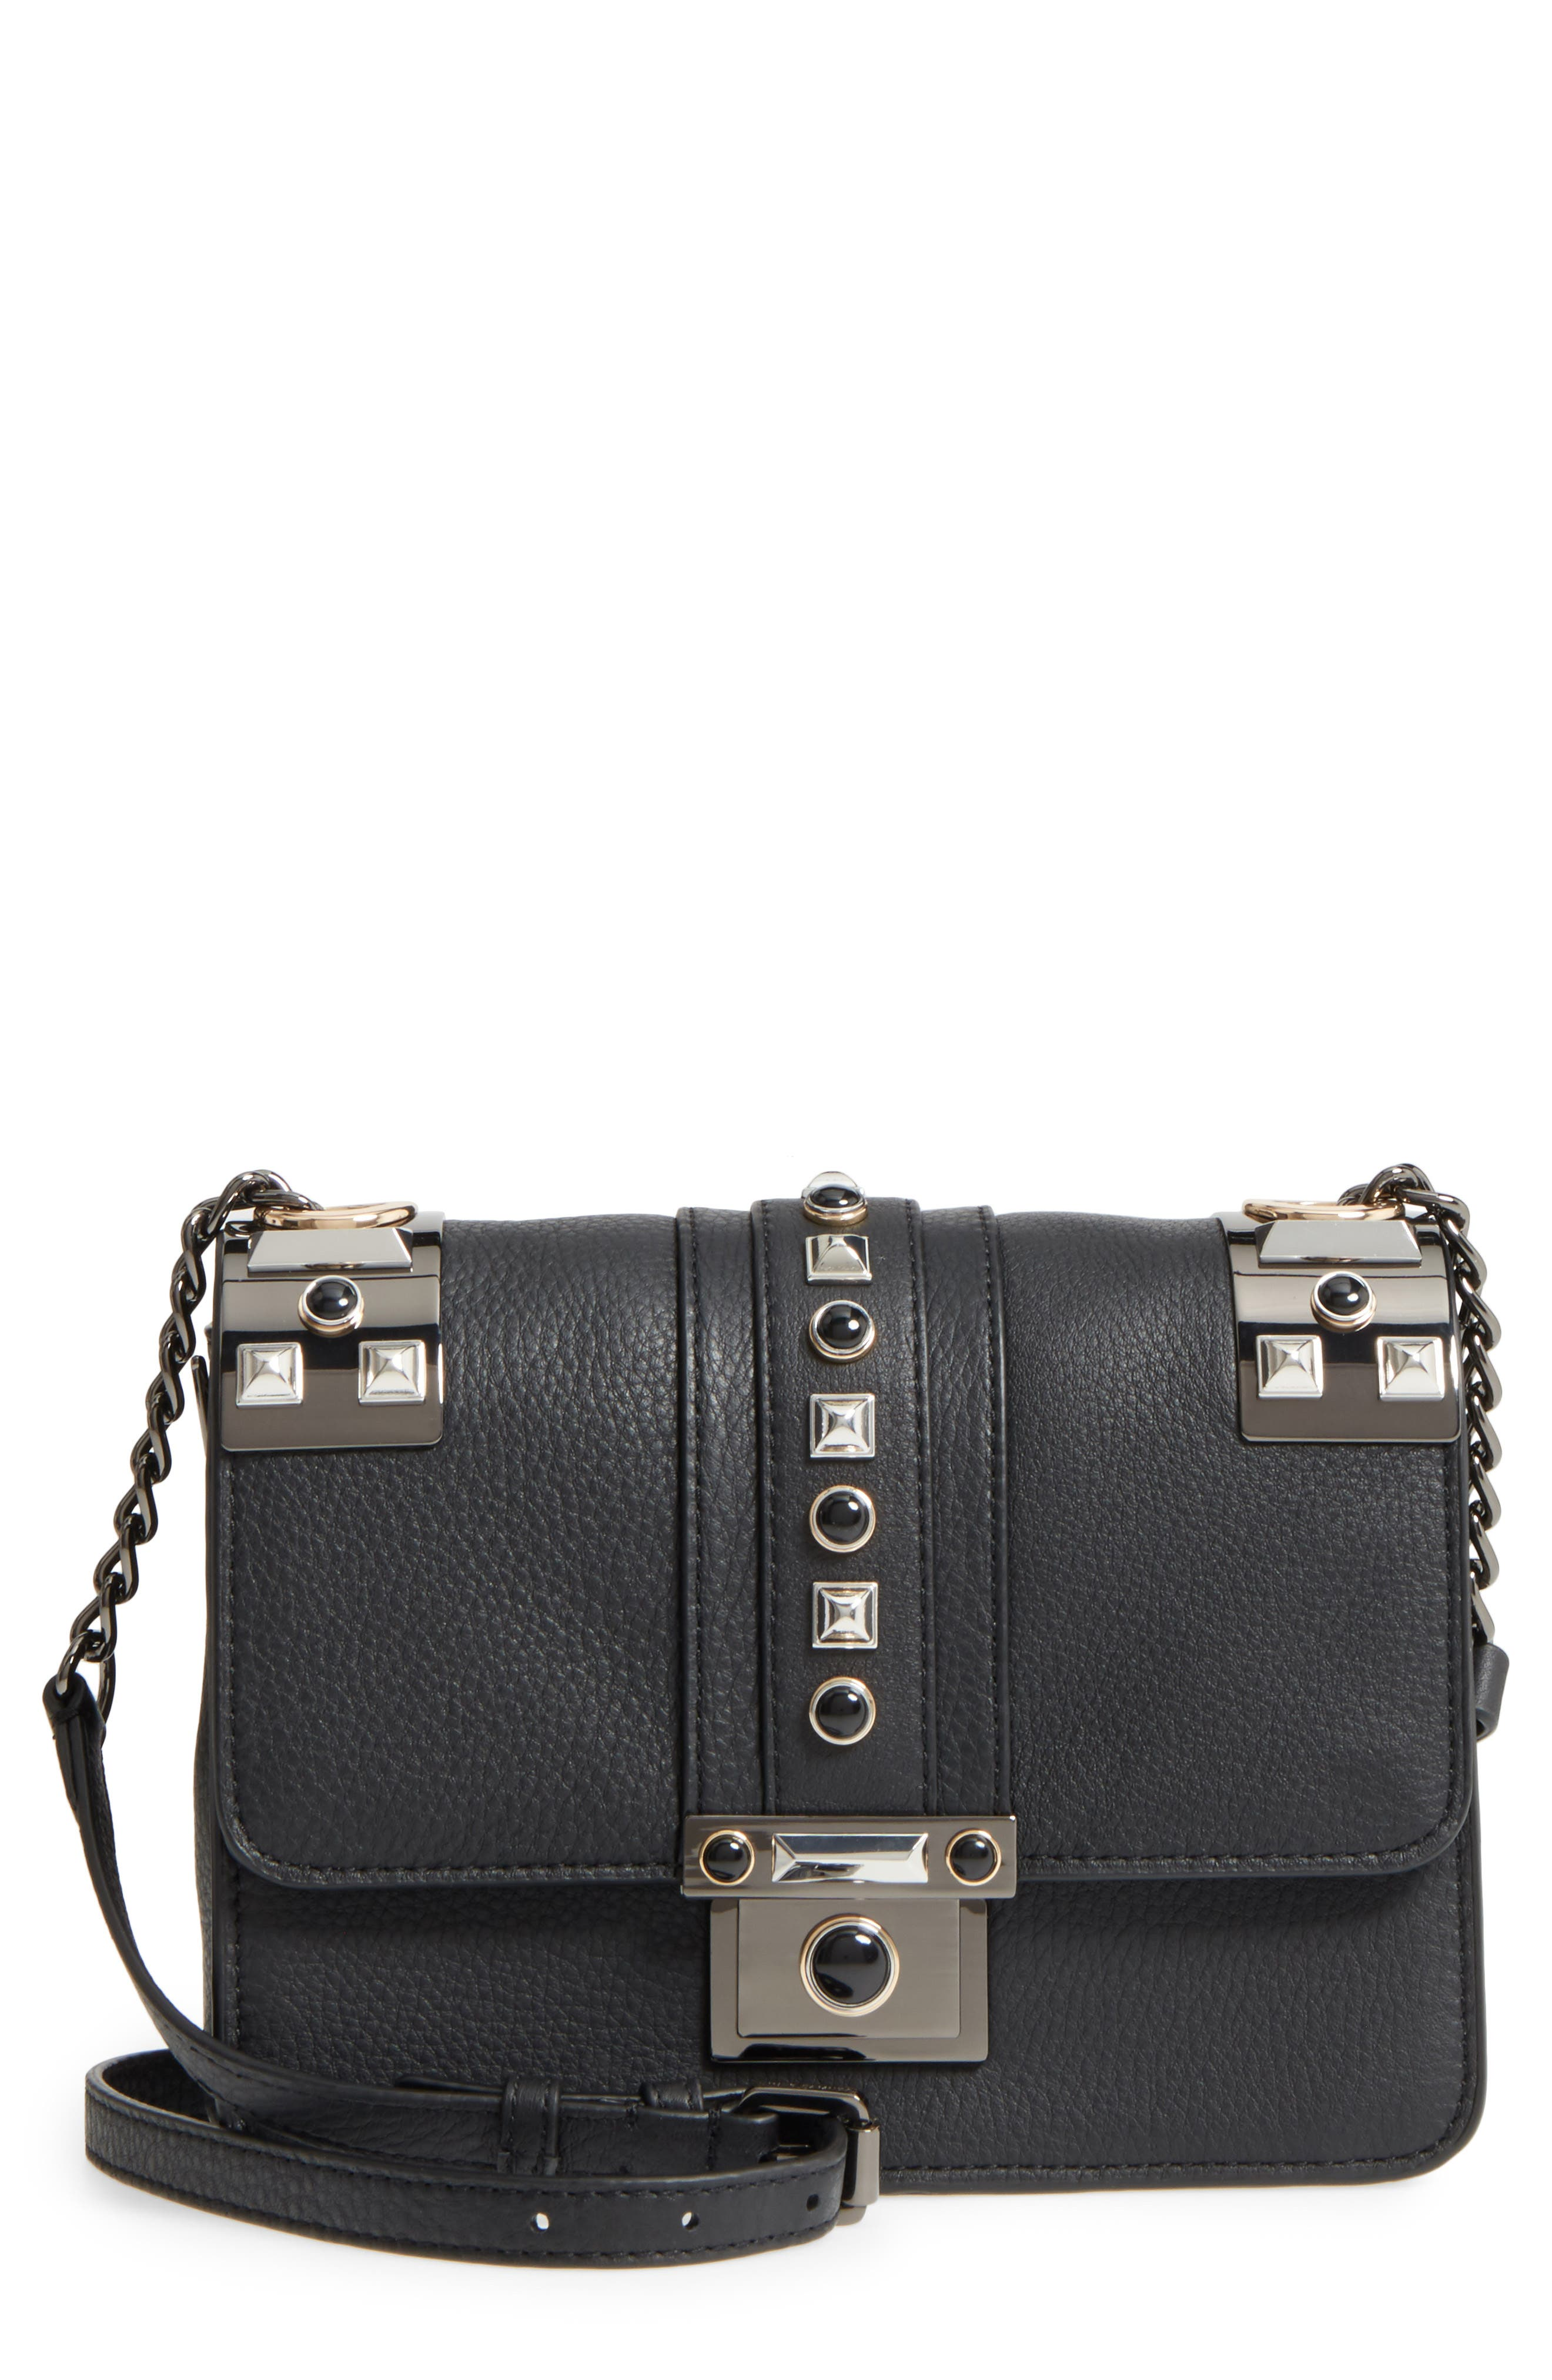 Main Image - Vince Camuto Bitty Studded Leather Shoulder Bag